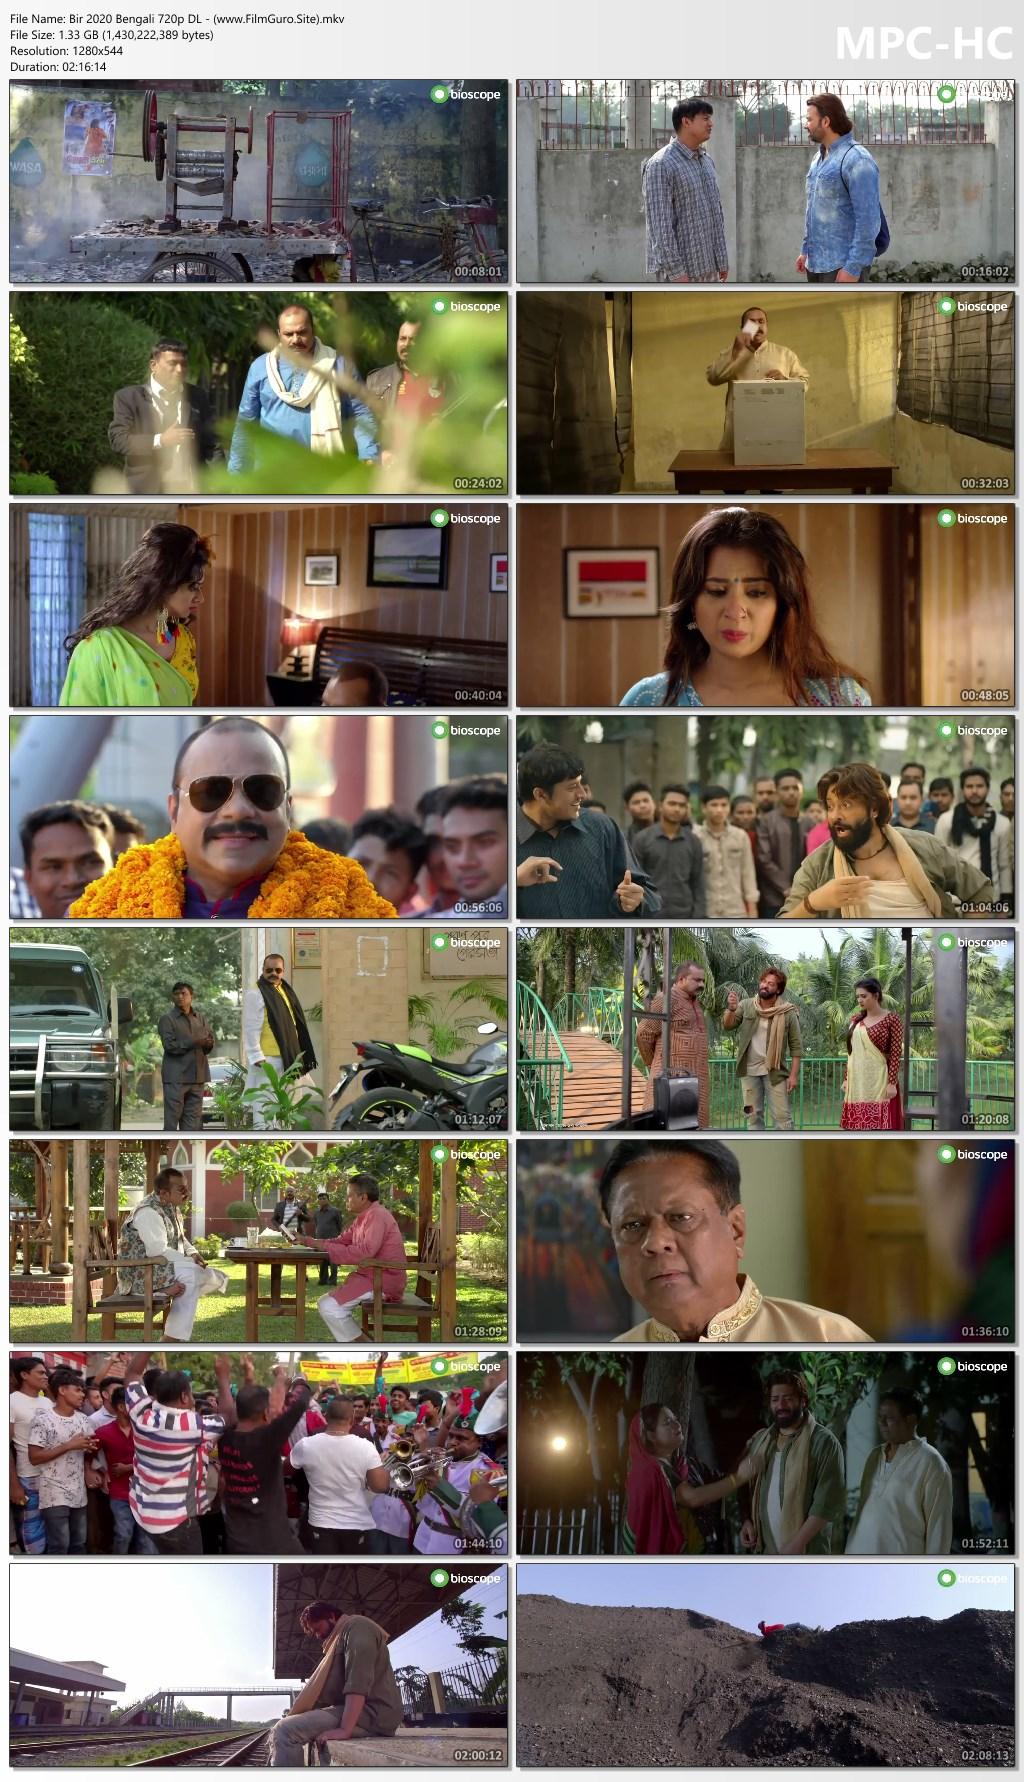 Bir-2020-Bengali-720p-DL-www-Film-Guro-Site-mkv-thumbs